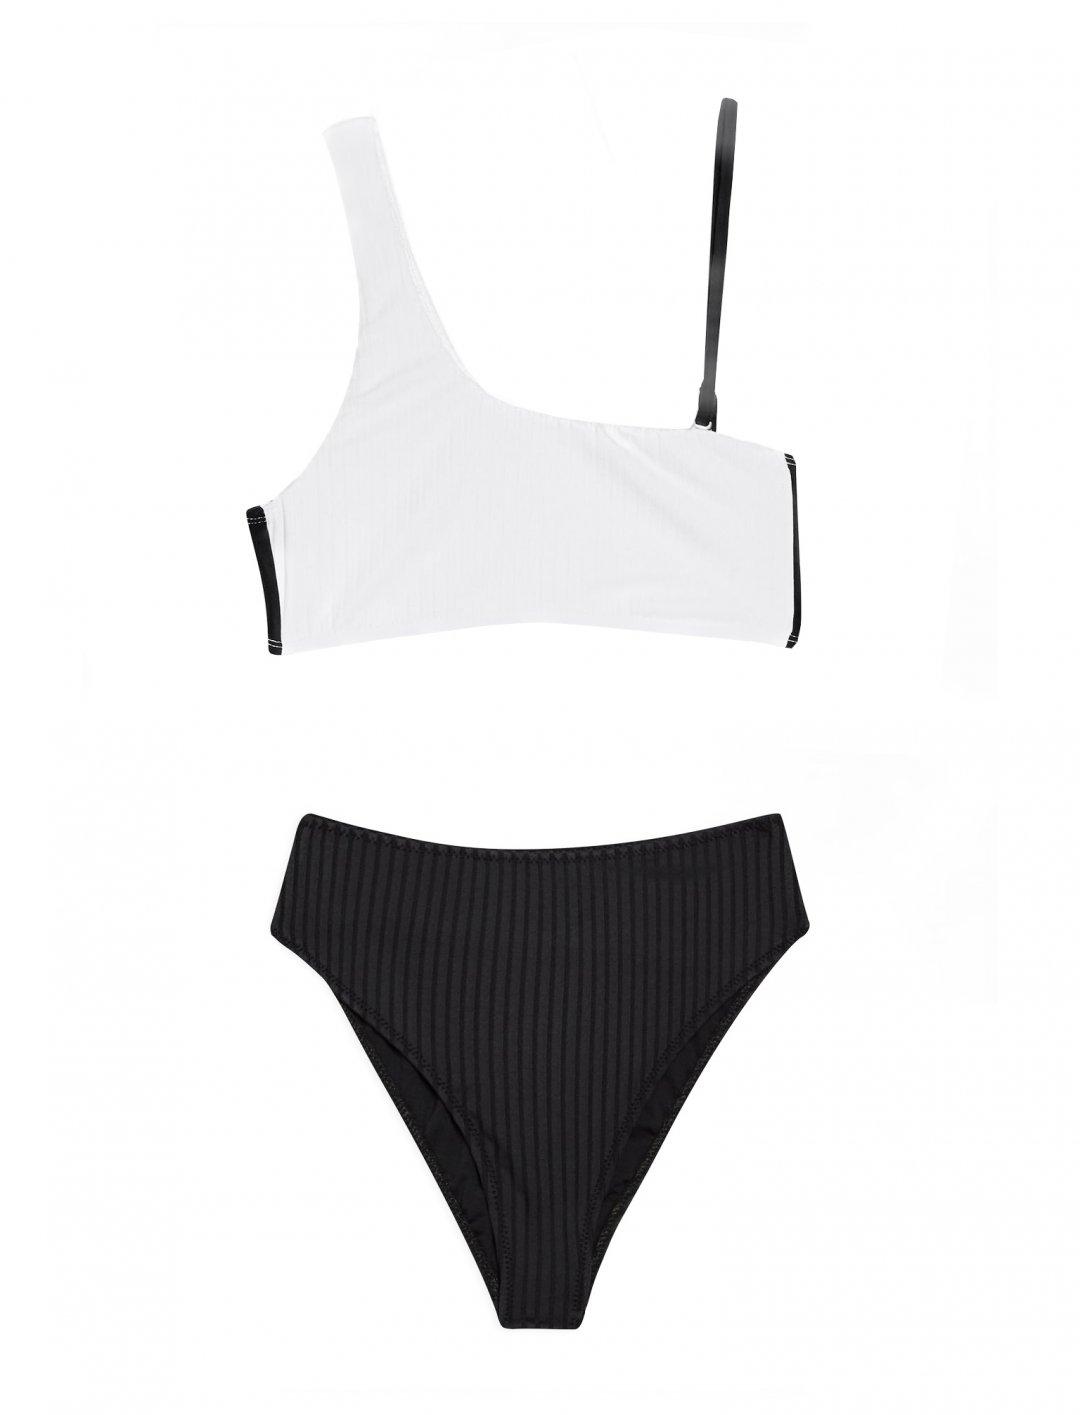 a9db7a5f2c 2019 bikini trends: SS19 Swimwear Trends That Put Basic Bikinis to Shame